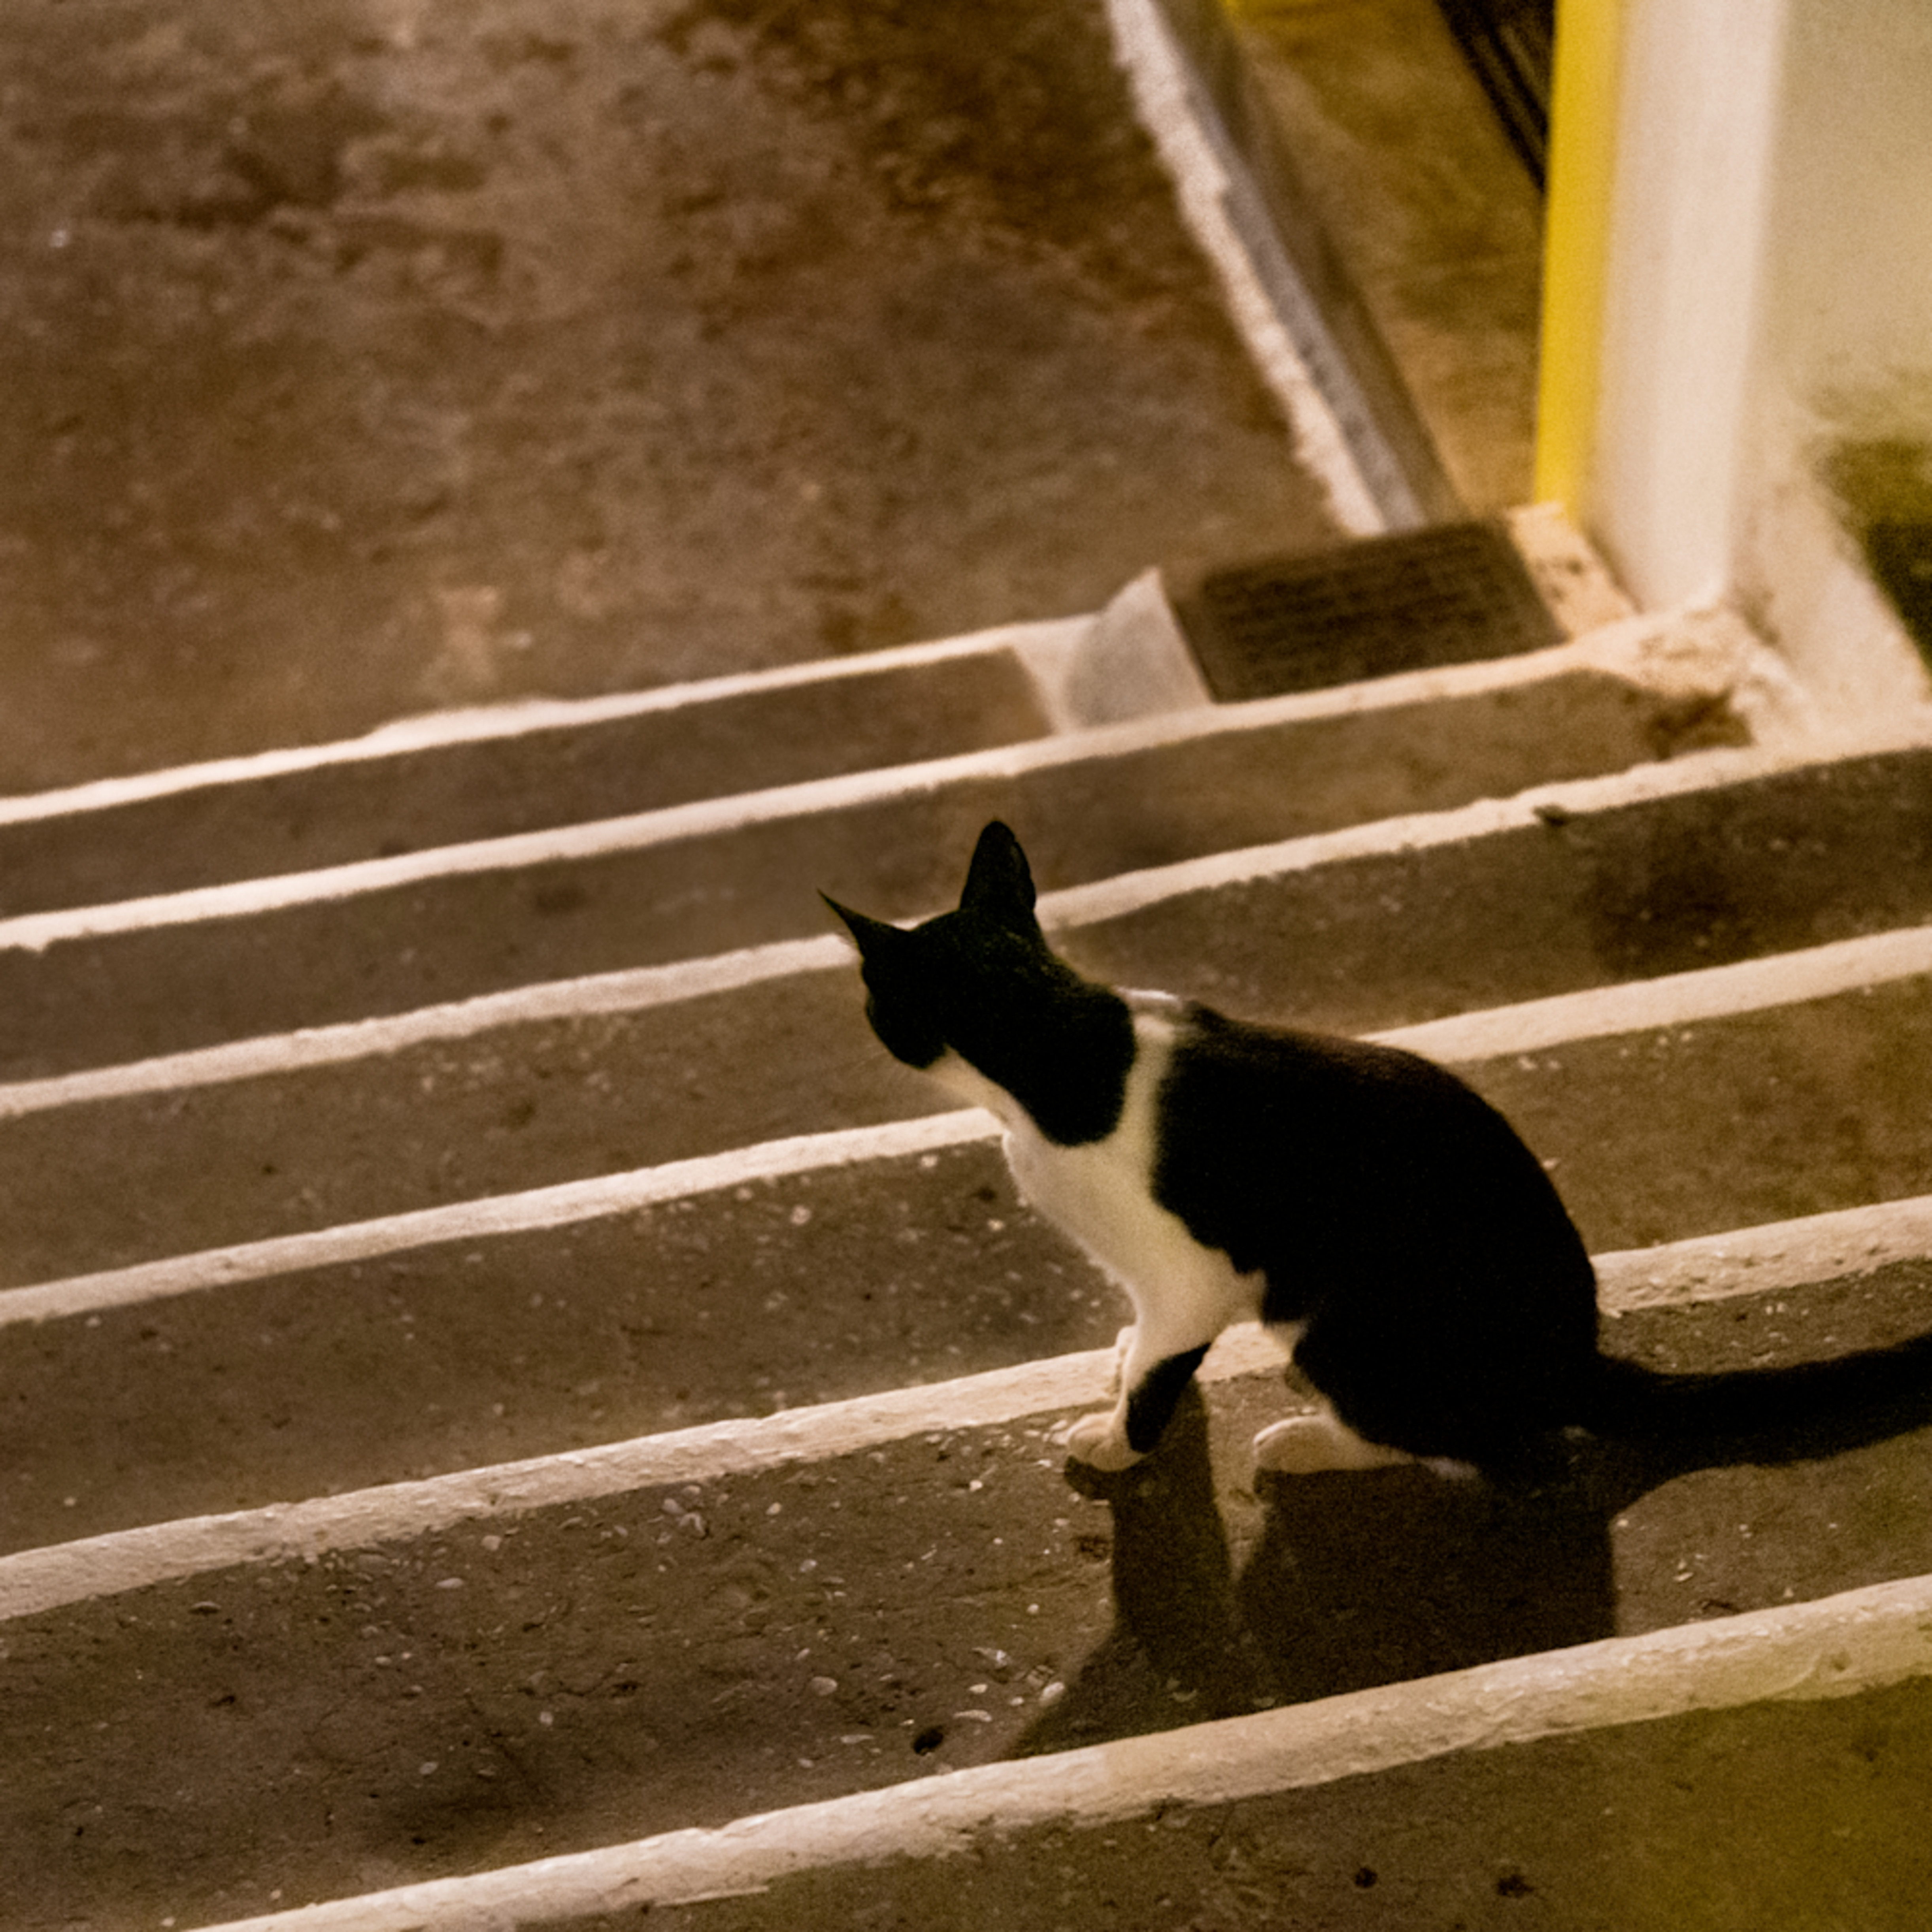 Black cat looking down the steps bap 0705 xpfojv